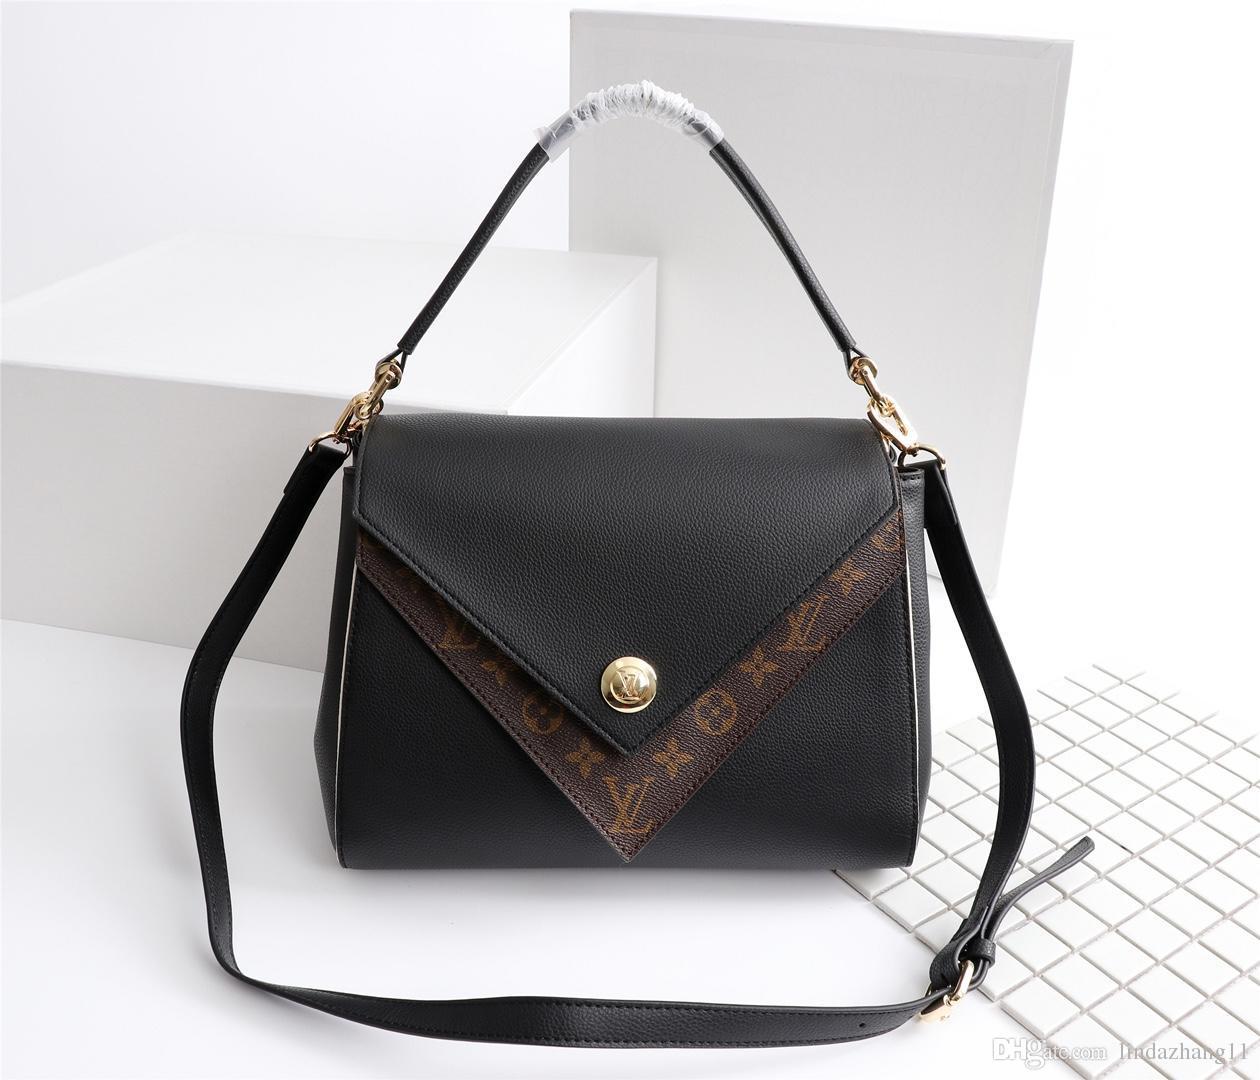 11c960d05 New Styles Fashion Bags 2019 Ladies Handbags Designer Bags Women Tote Bag  High Quality Single Shoulder Bag Size 28*21*16cm M54439 01 Osprey Backpacks  Book ...